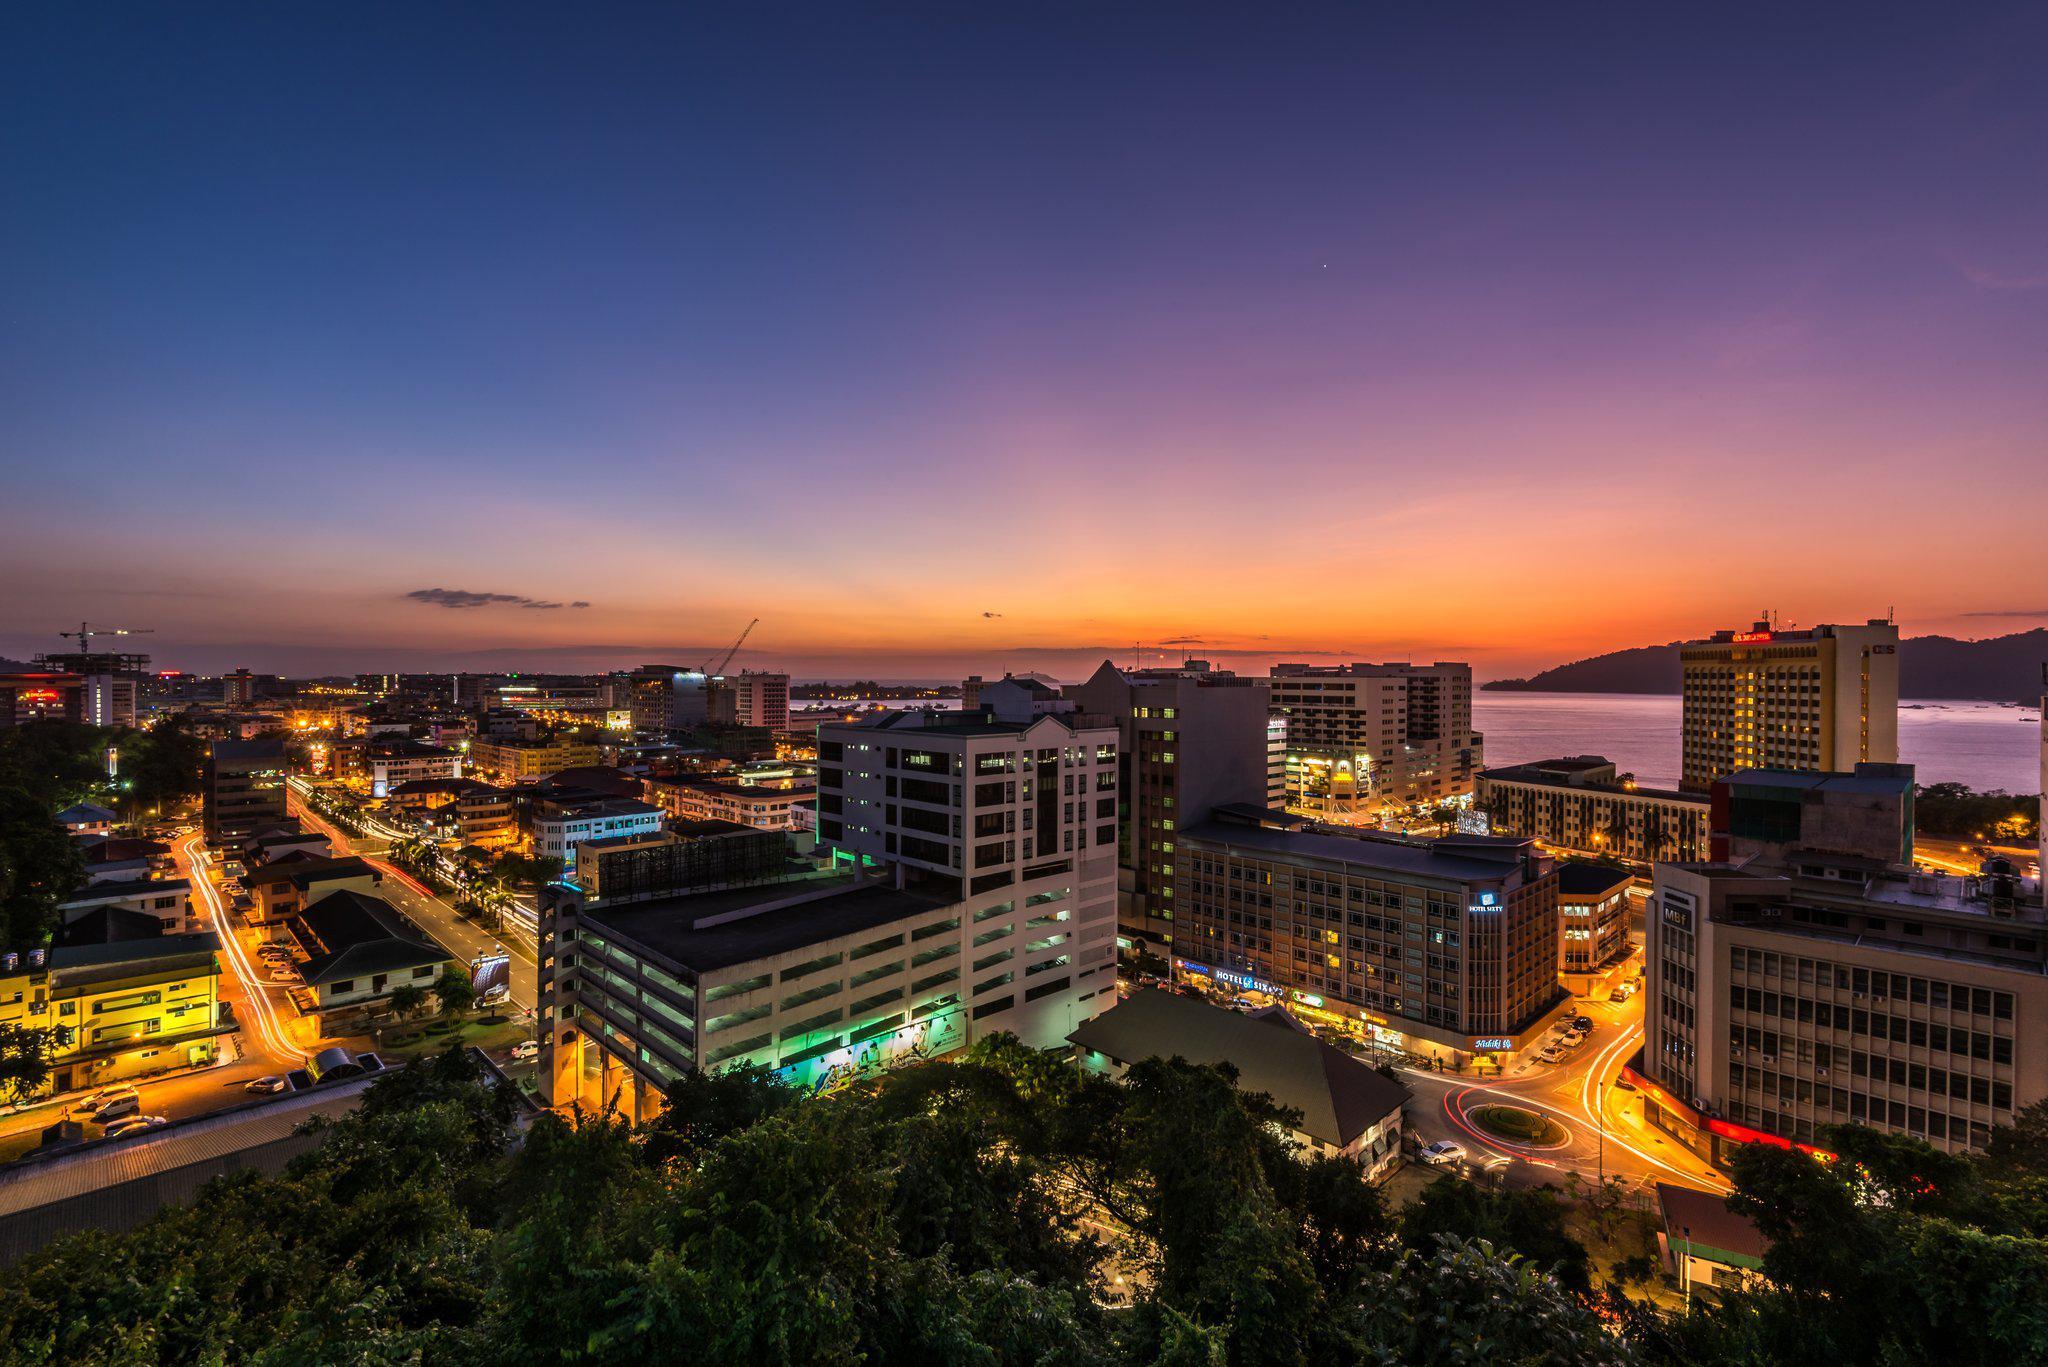 Holiday Inn Express Kota Kinabalu City Centre